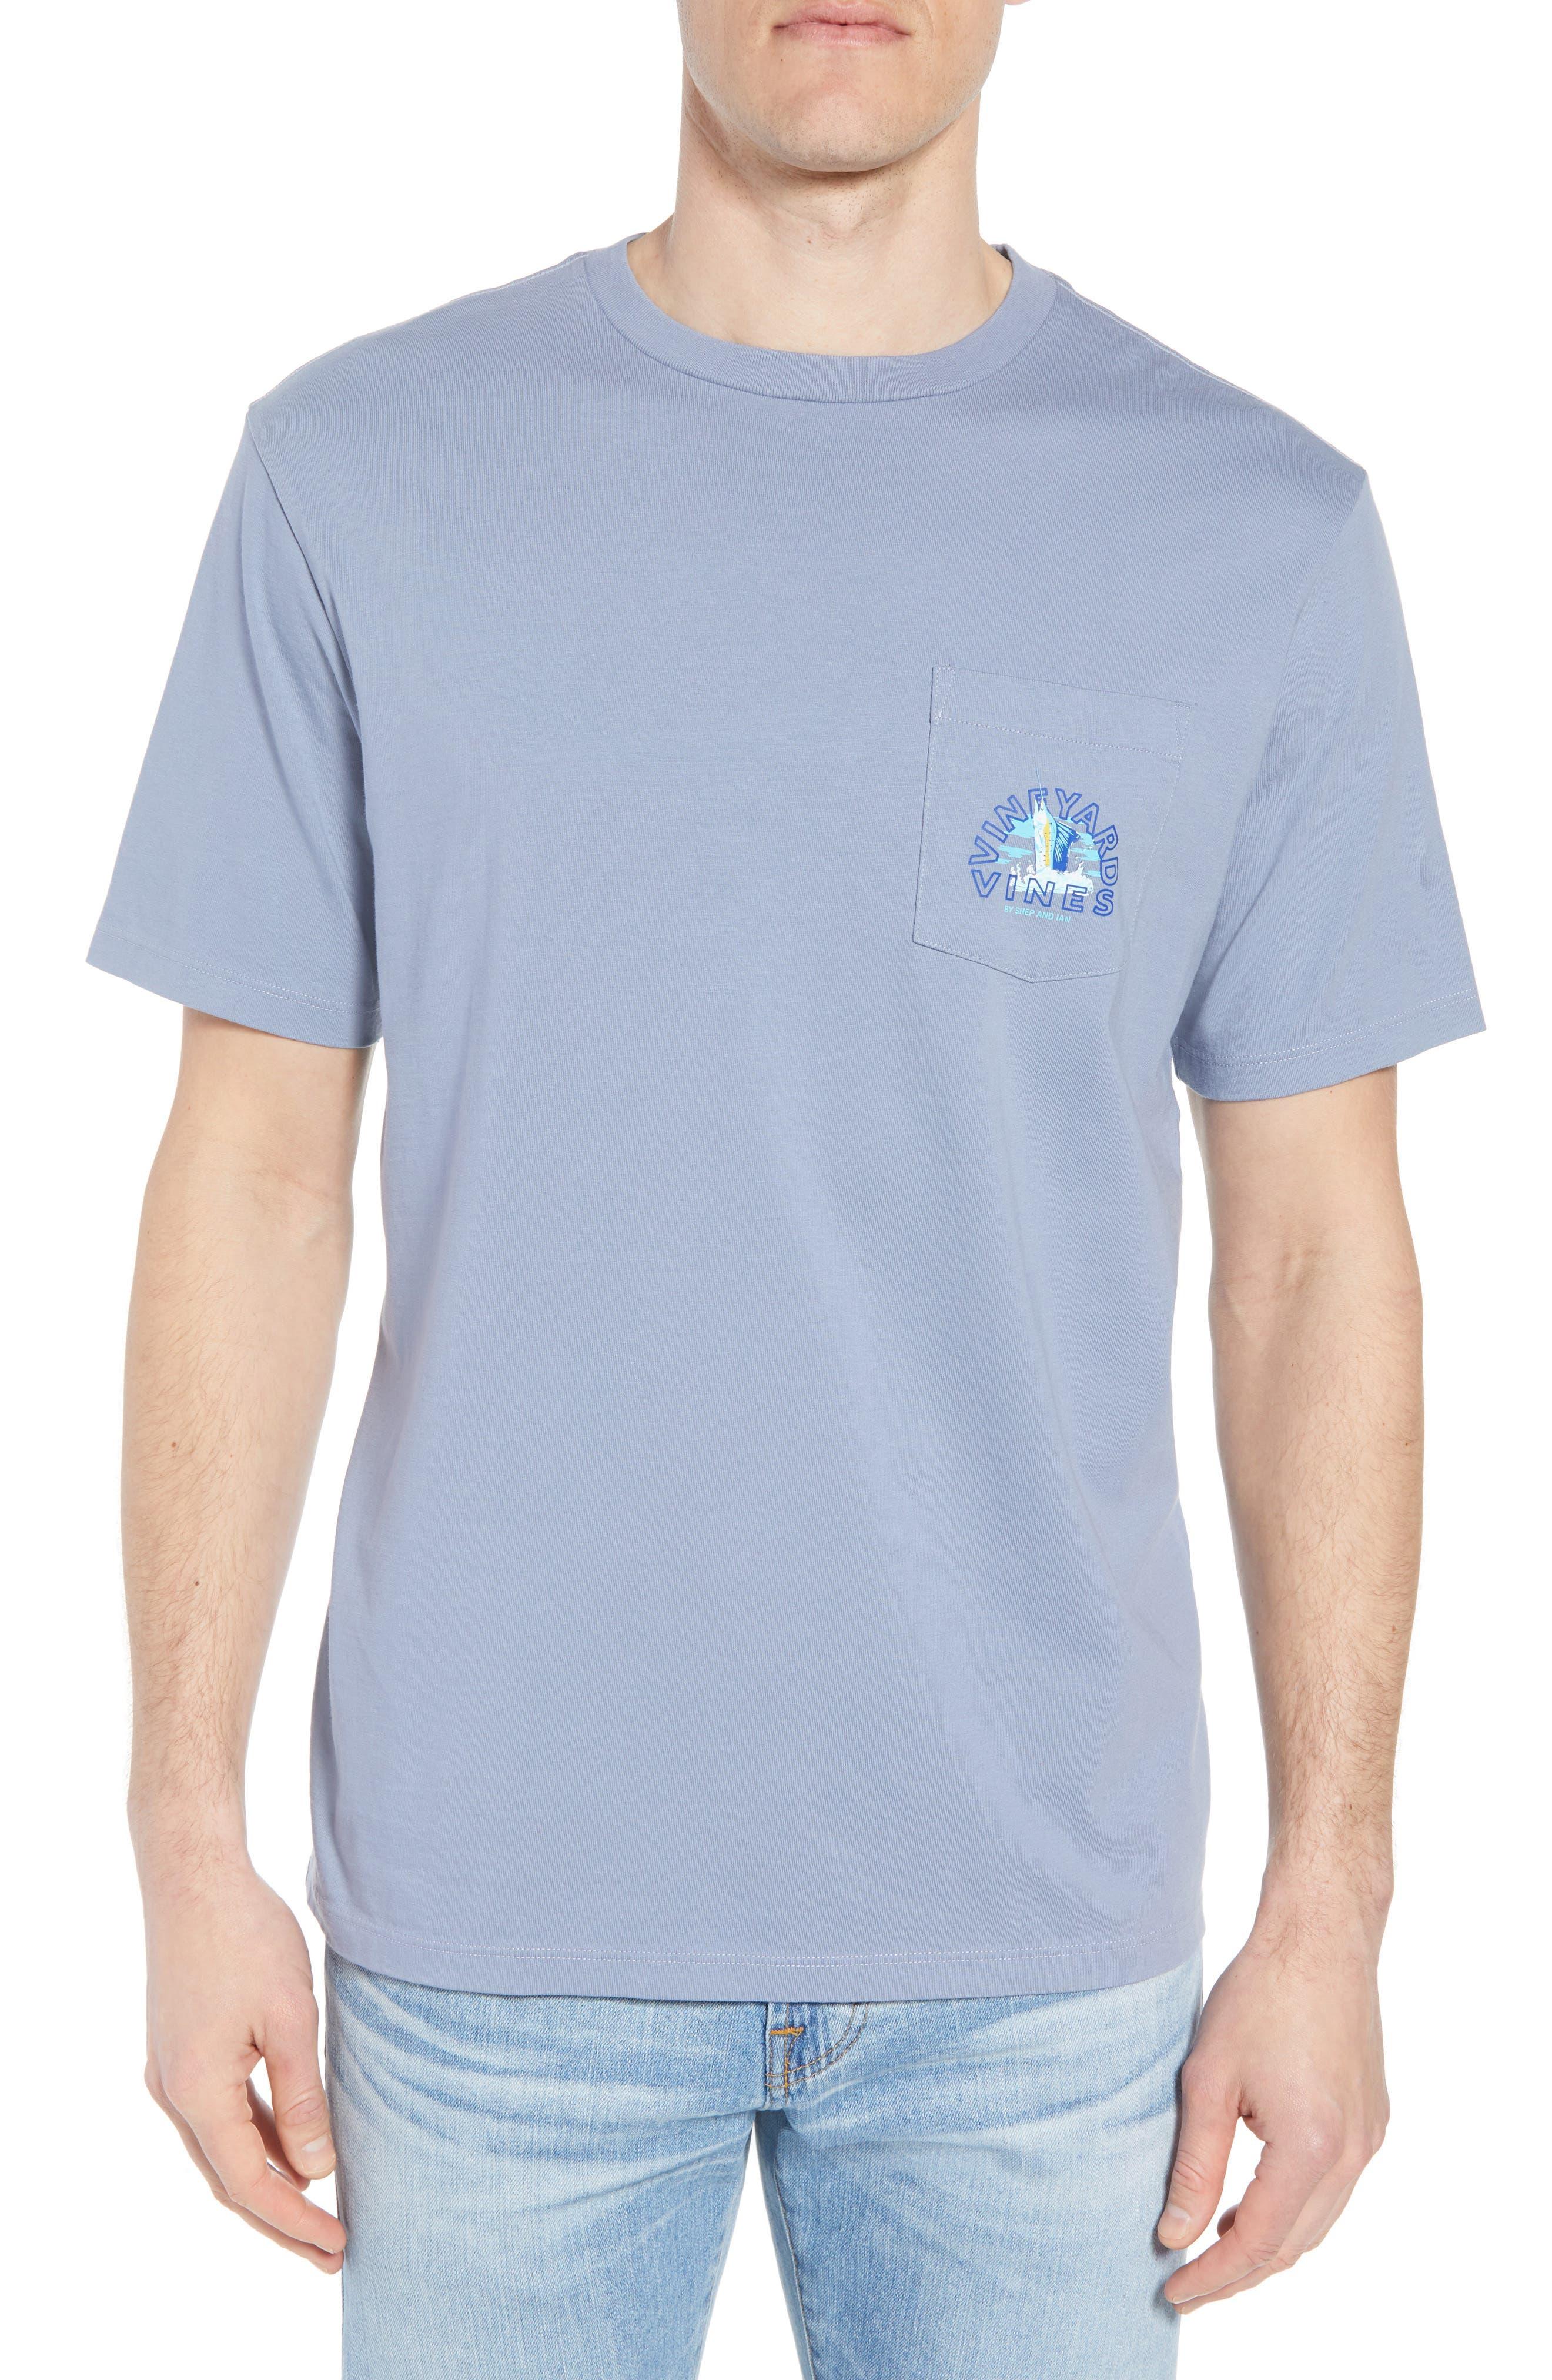 Casting Call Crewneck T-Shirt,                         Main,                         color, 411